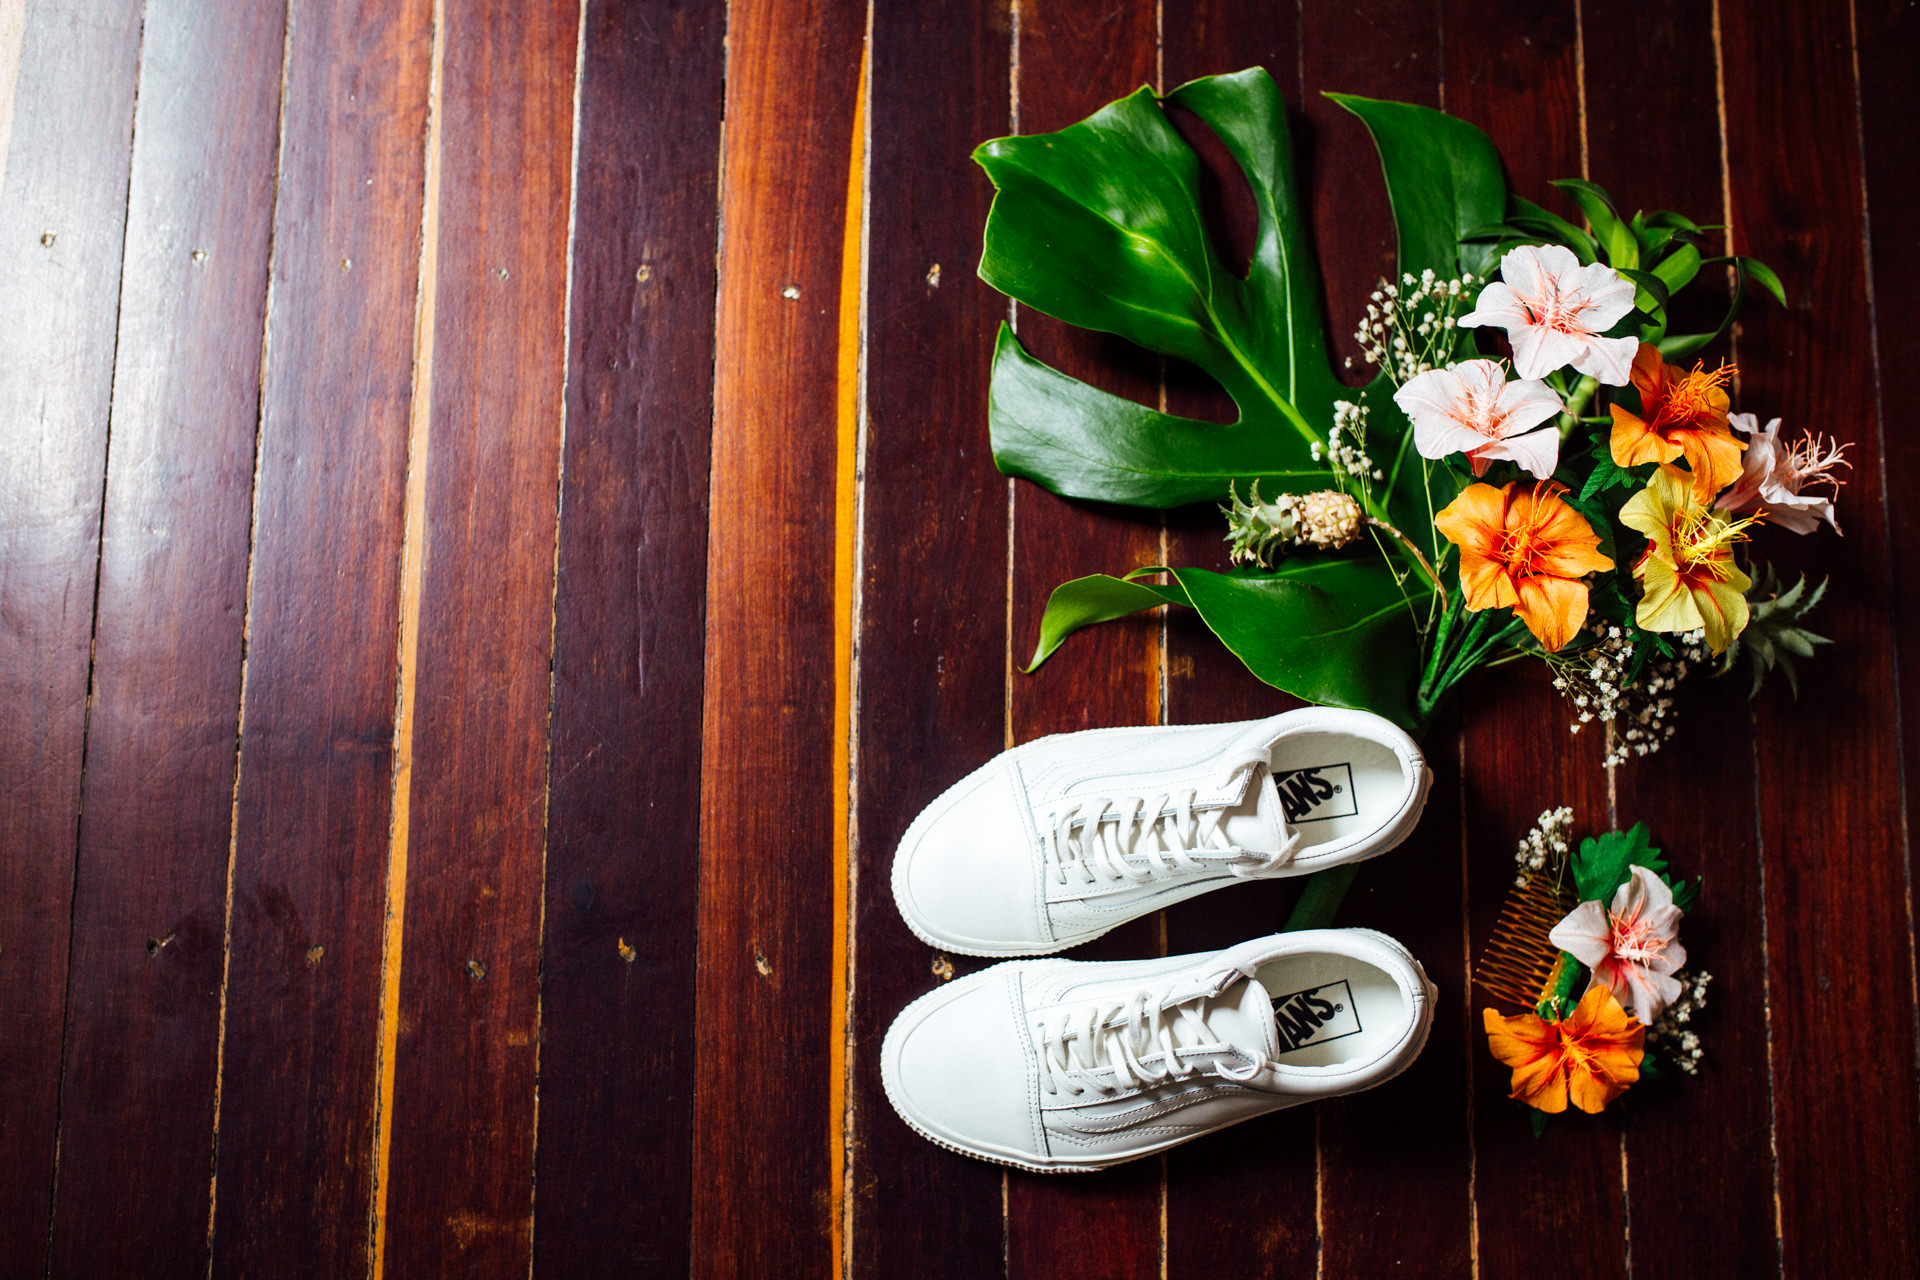 Wedding-Boda-Matrimonio-Fotografo-Fotografia-bodas-Medellin-Llanogrande-Colombia-Bogota-Cartagena-Miami-Wed-Destination-Photojournalism (22).JPG